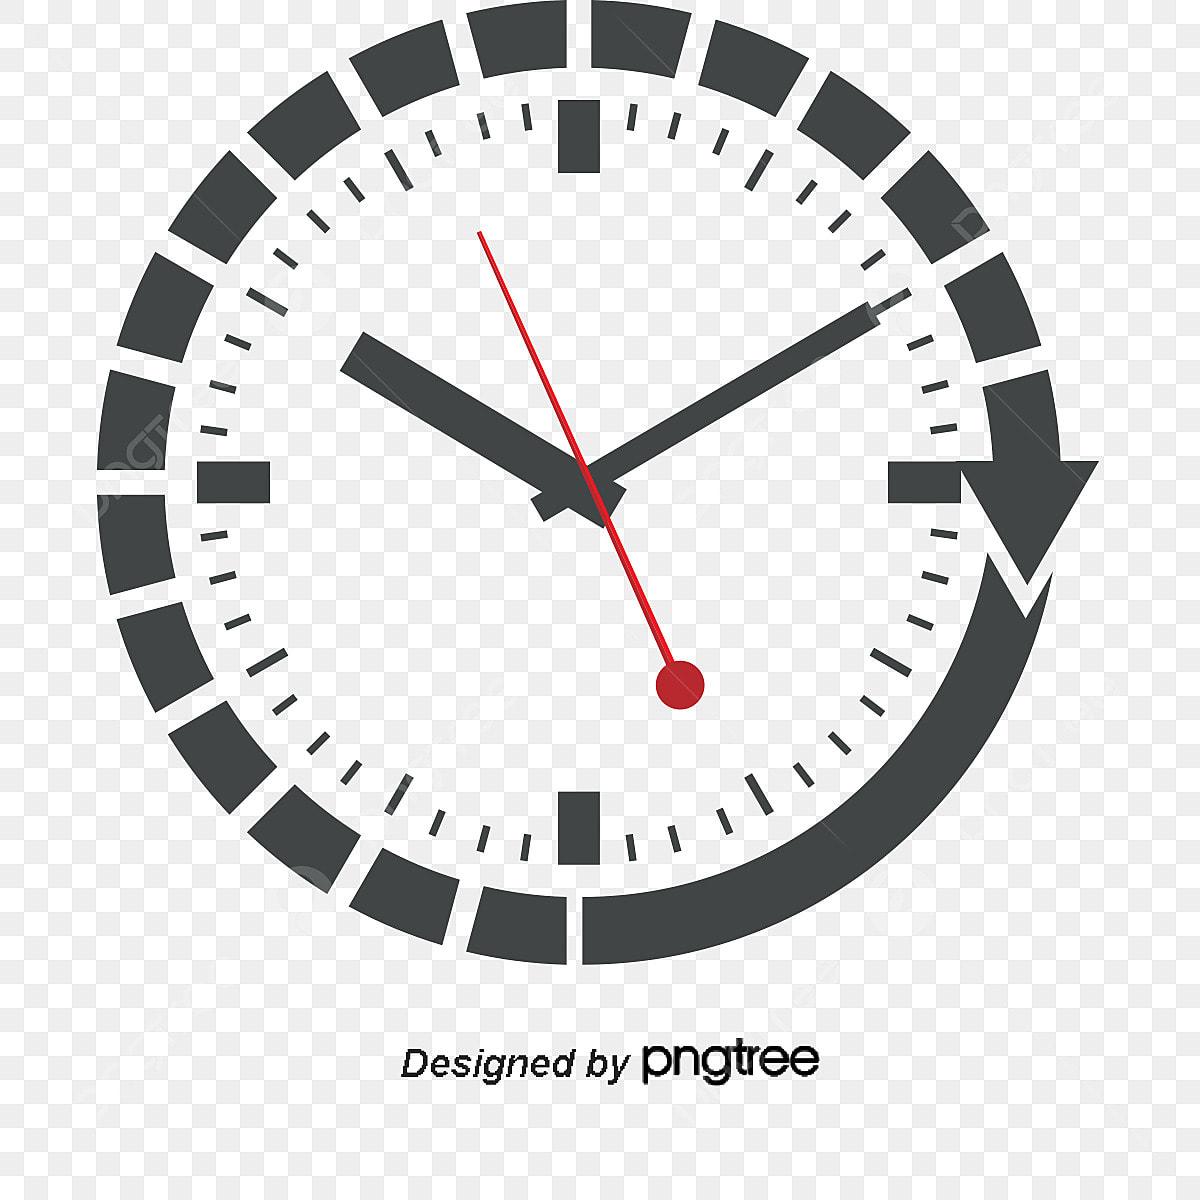 Reloj Watch Design Vector Material Reloj Reloj Diseño